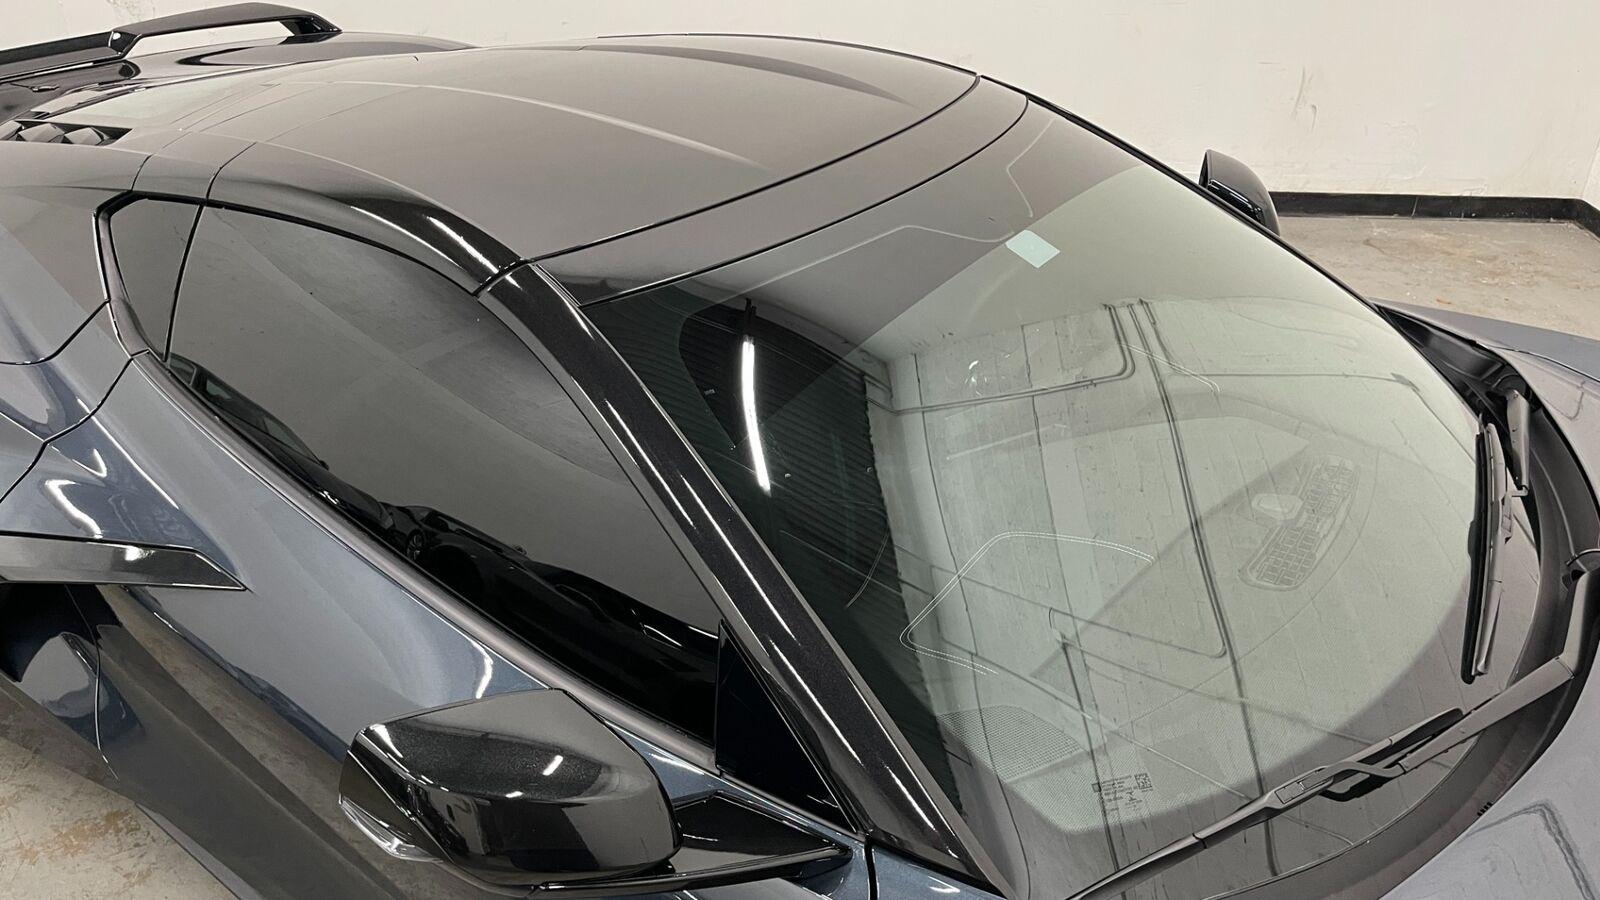 2020 Gray Chevrolet Corvette Stingray 1LT | C7 Corvette Photo 6